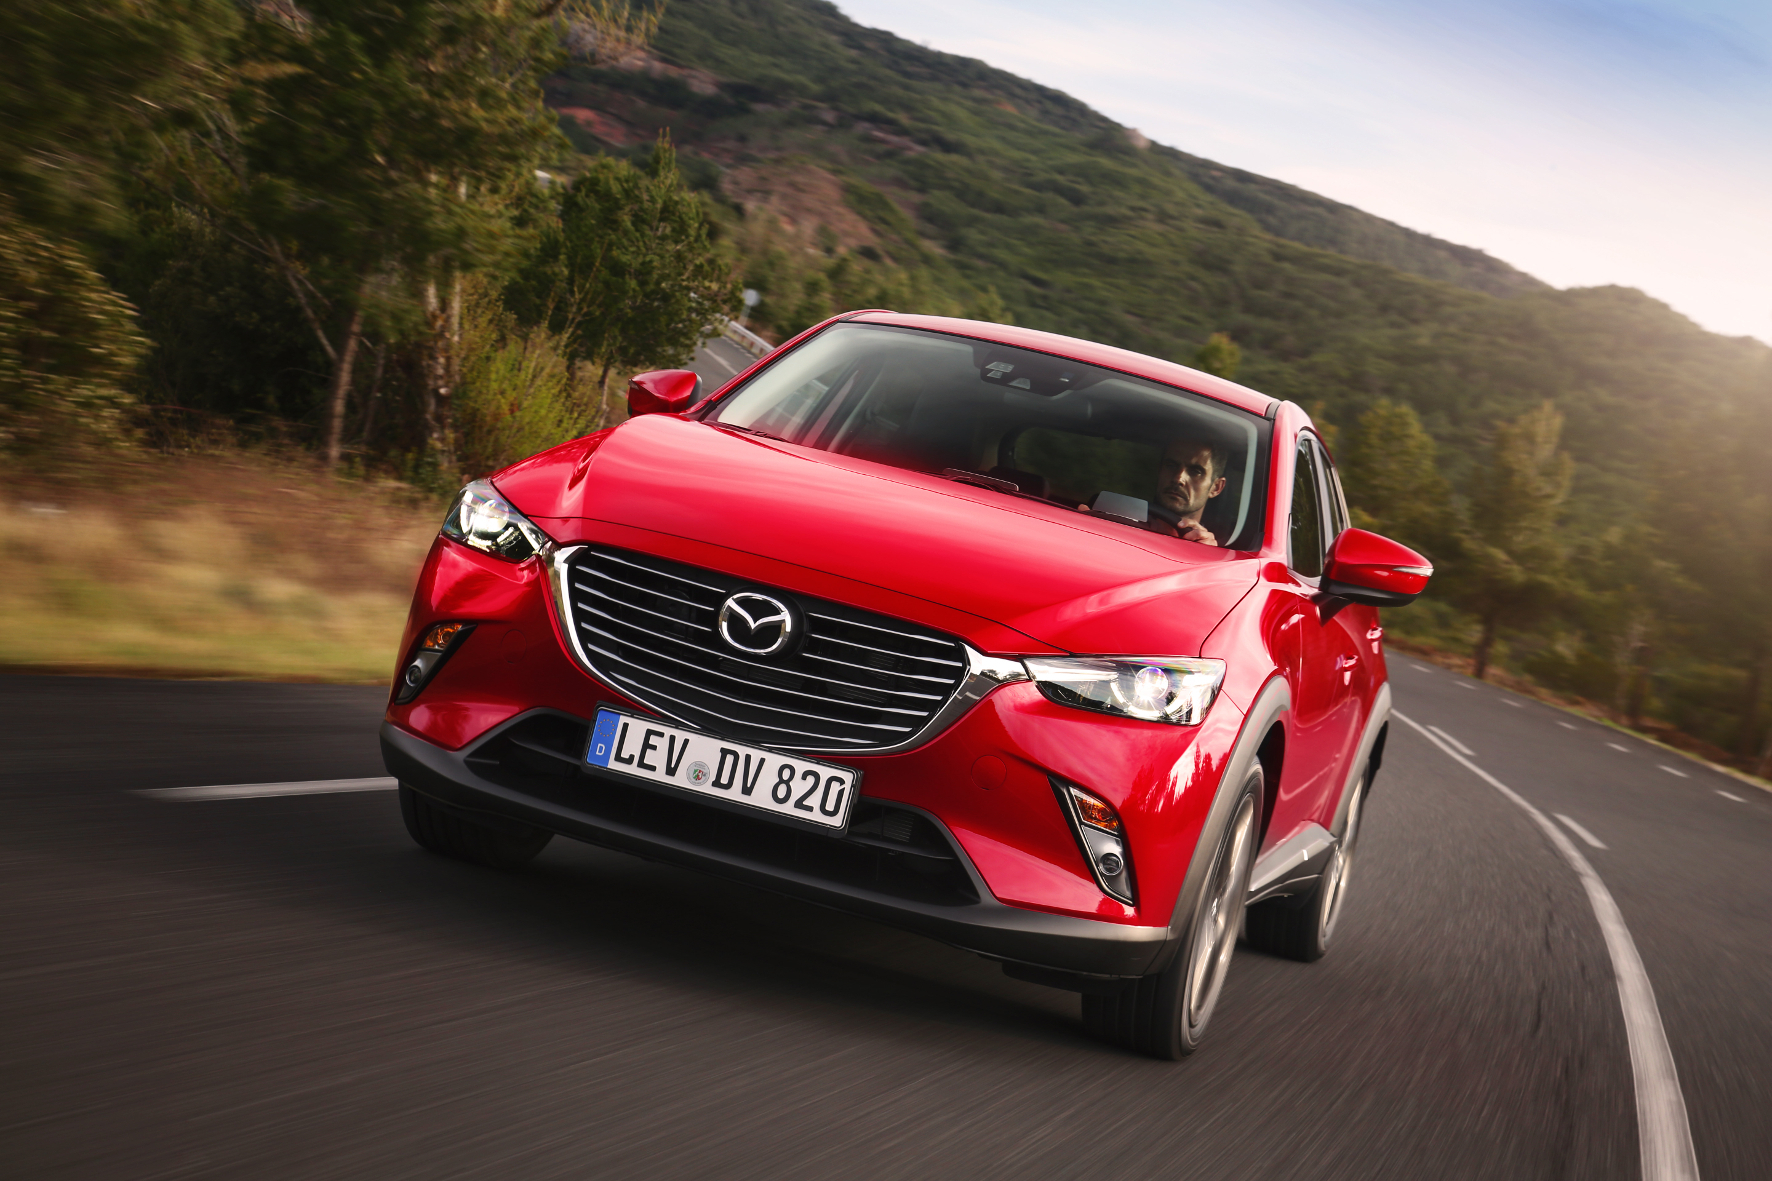 mid Groß-Gerau - Kompakt-SUV ohne Fehl und Tadel: der Mazda CX-3.